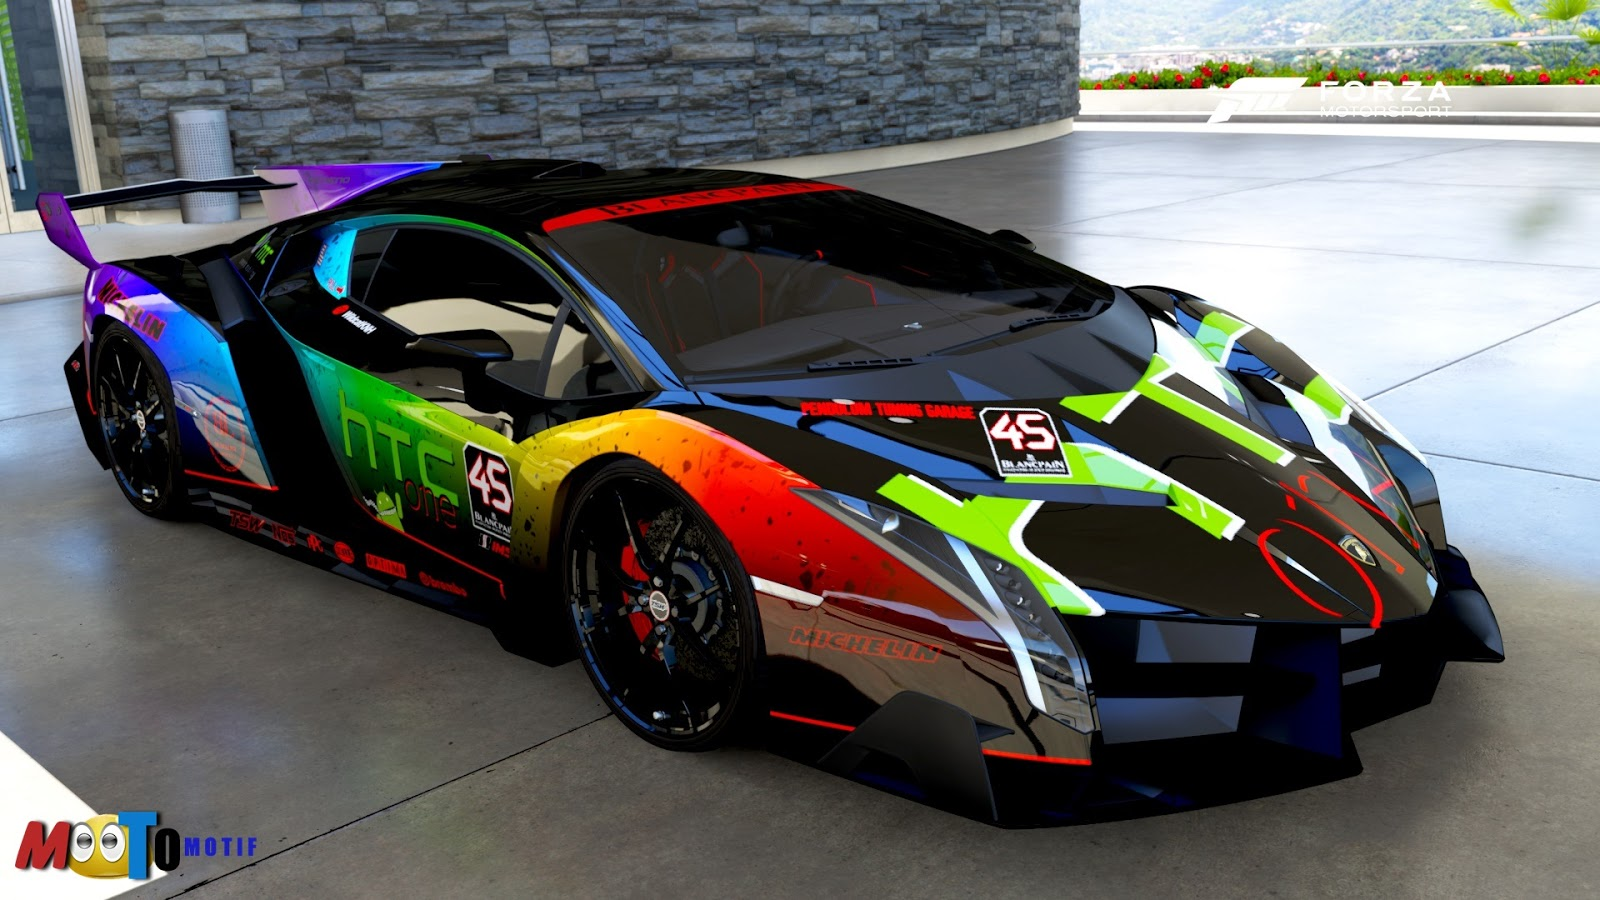 Foto Mobil Mobil Lamborghini Serba Ottomotif